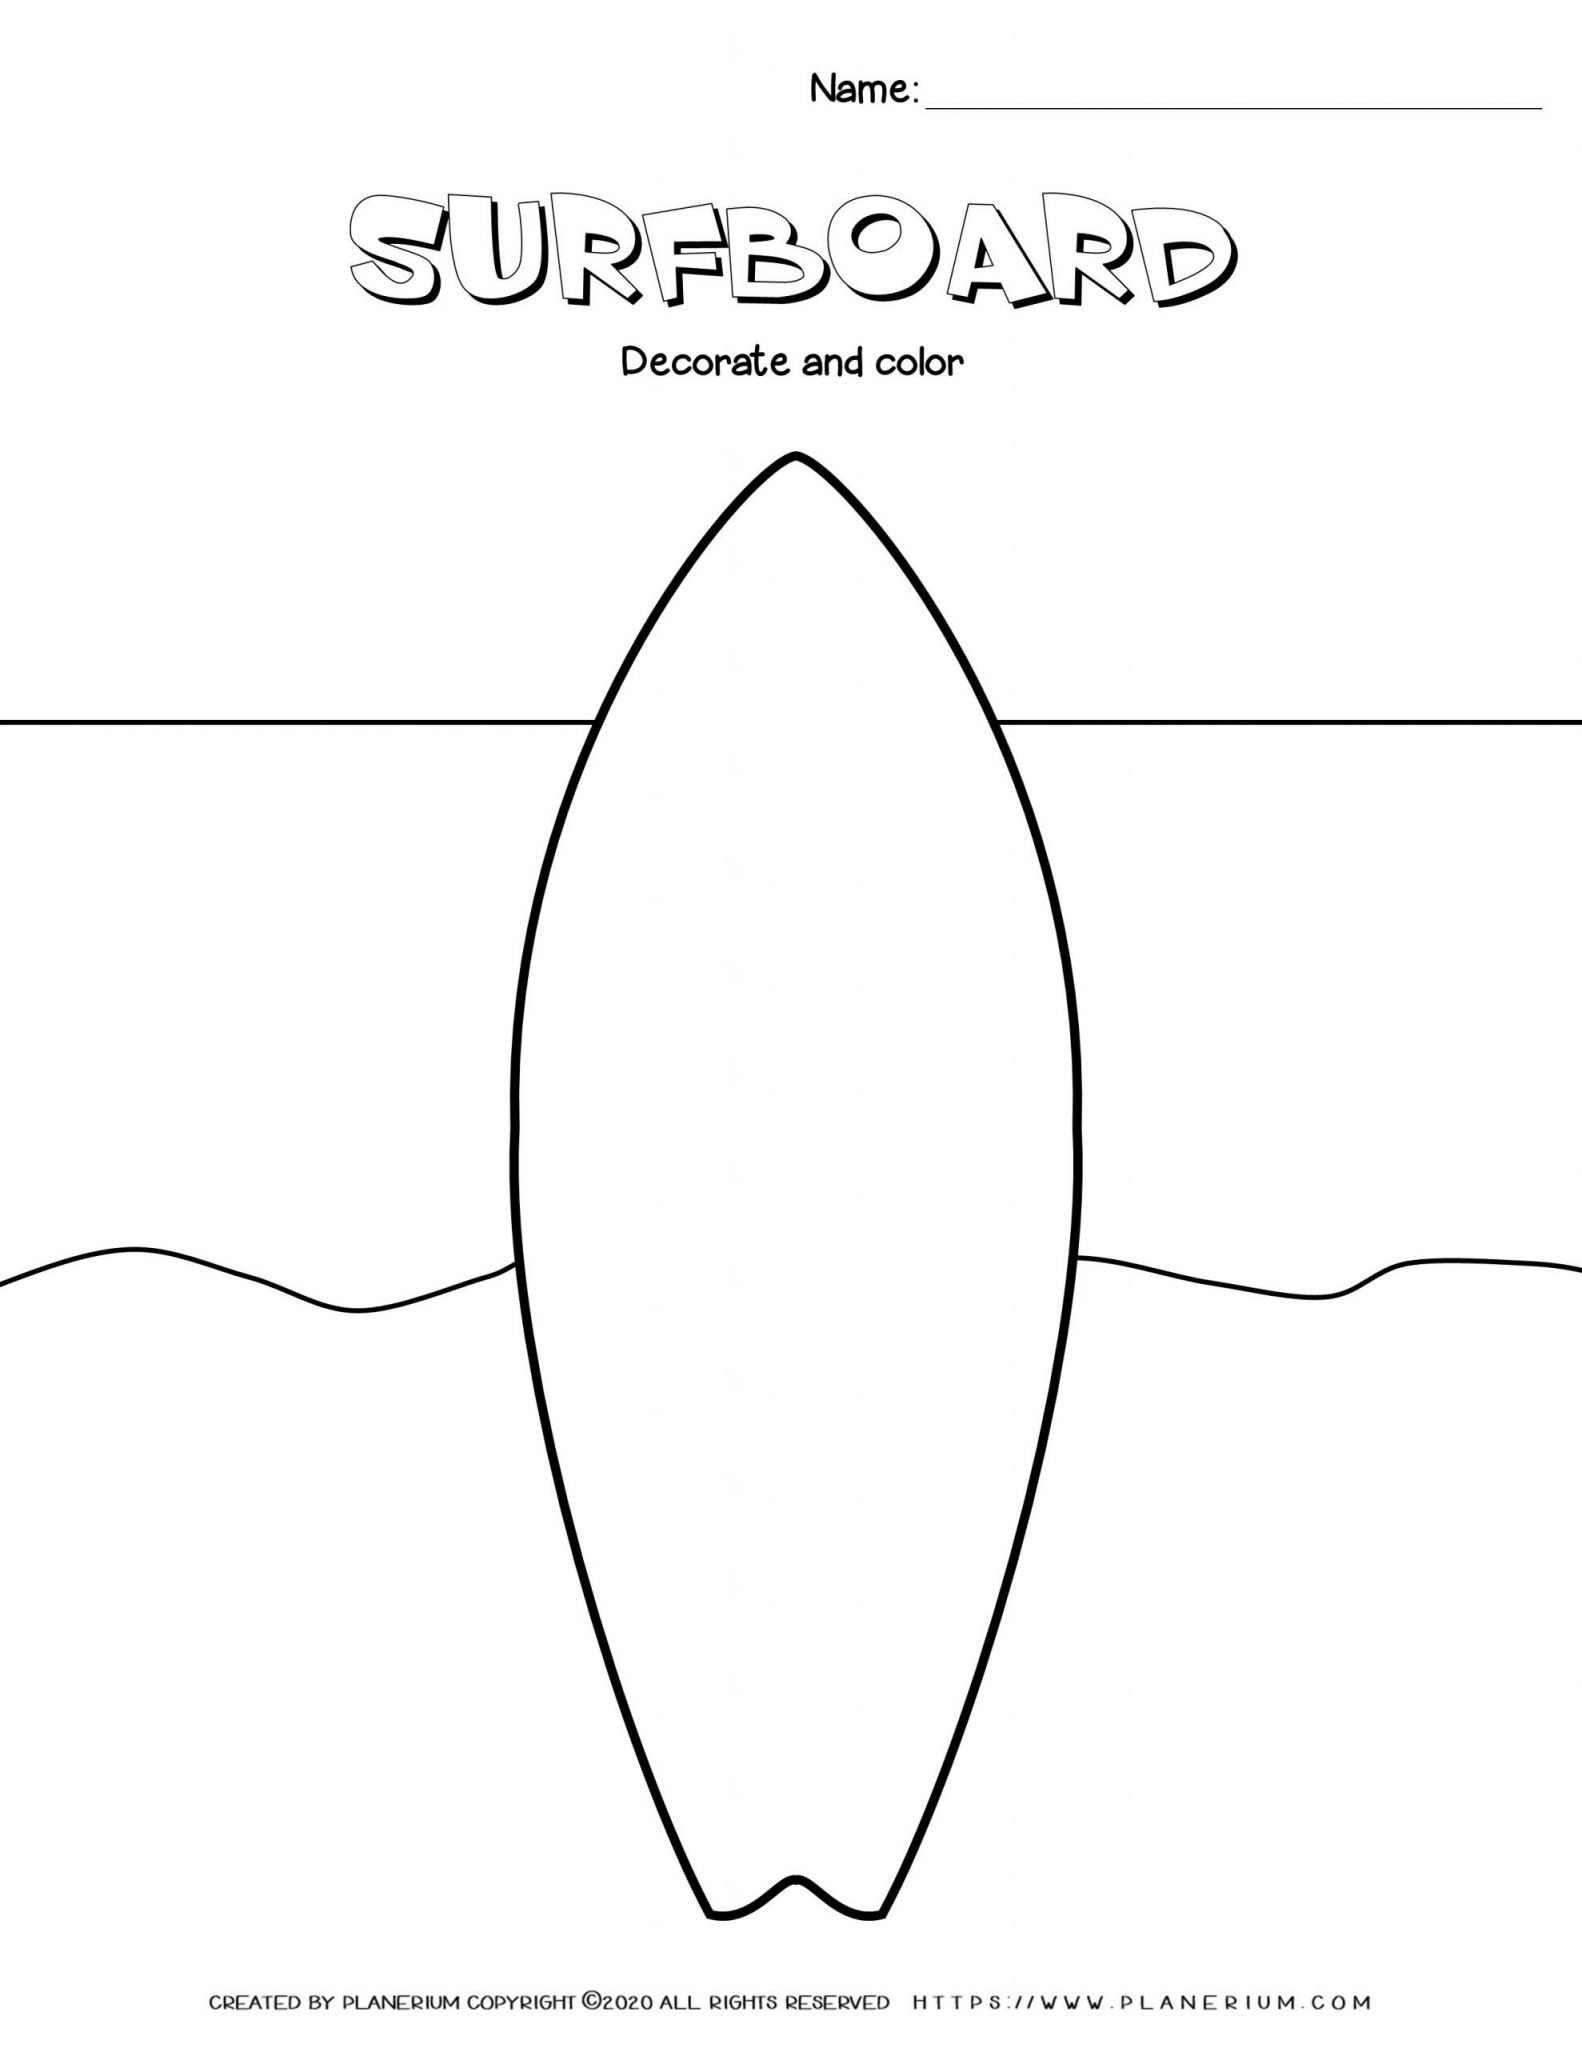 Summer - Worksheet - Decorate your Surfboard